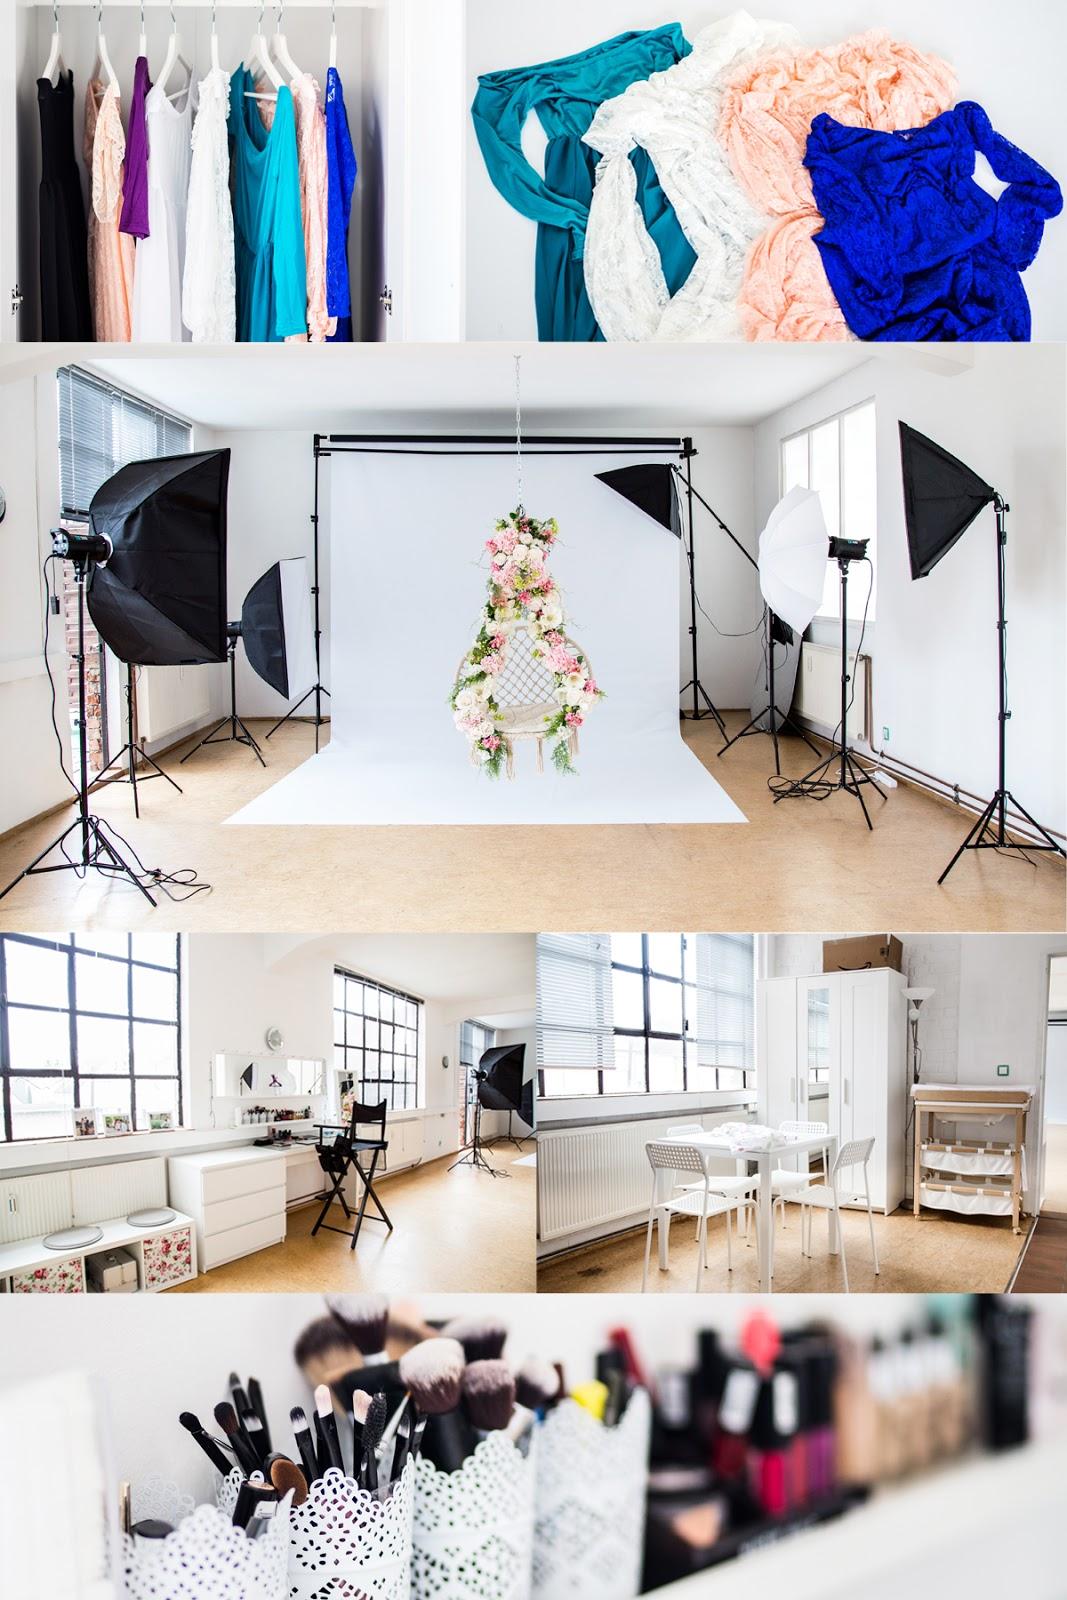 rodgau foto studio, rodgau fotostudio, rodgau weiskirchen, fotostudio frankfurt am main